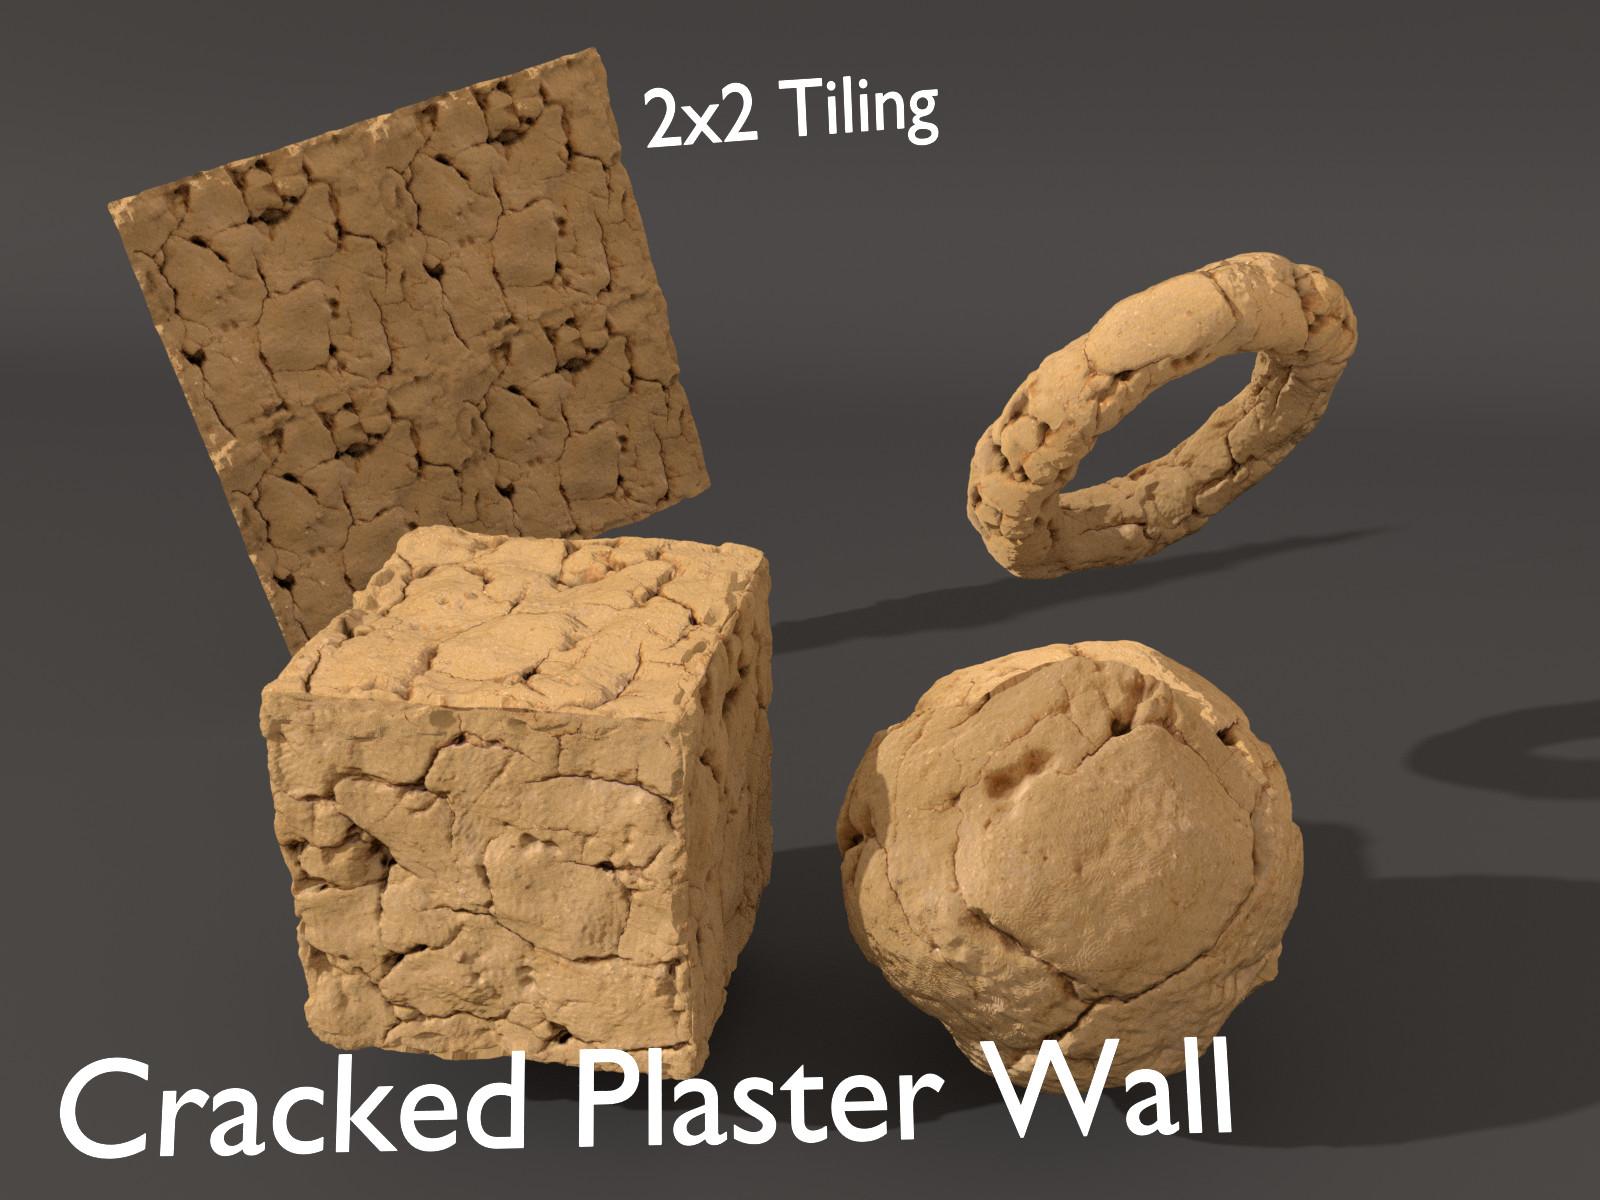 Sieben corgie crackedplasterwall p